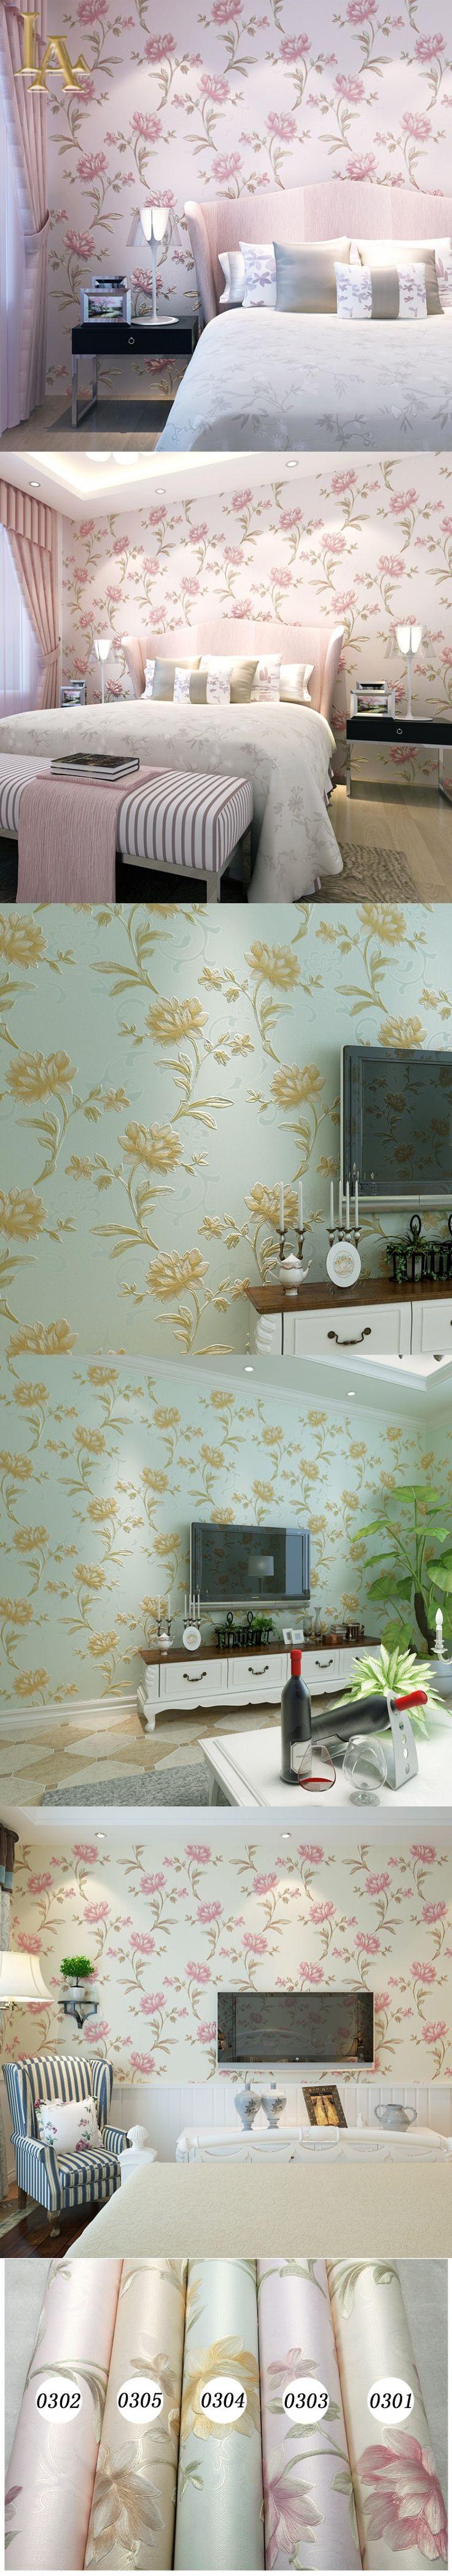 best 25 lotus flower wallpaper ideas on pinterest lotus